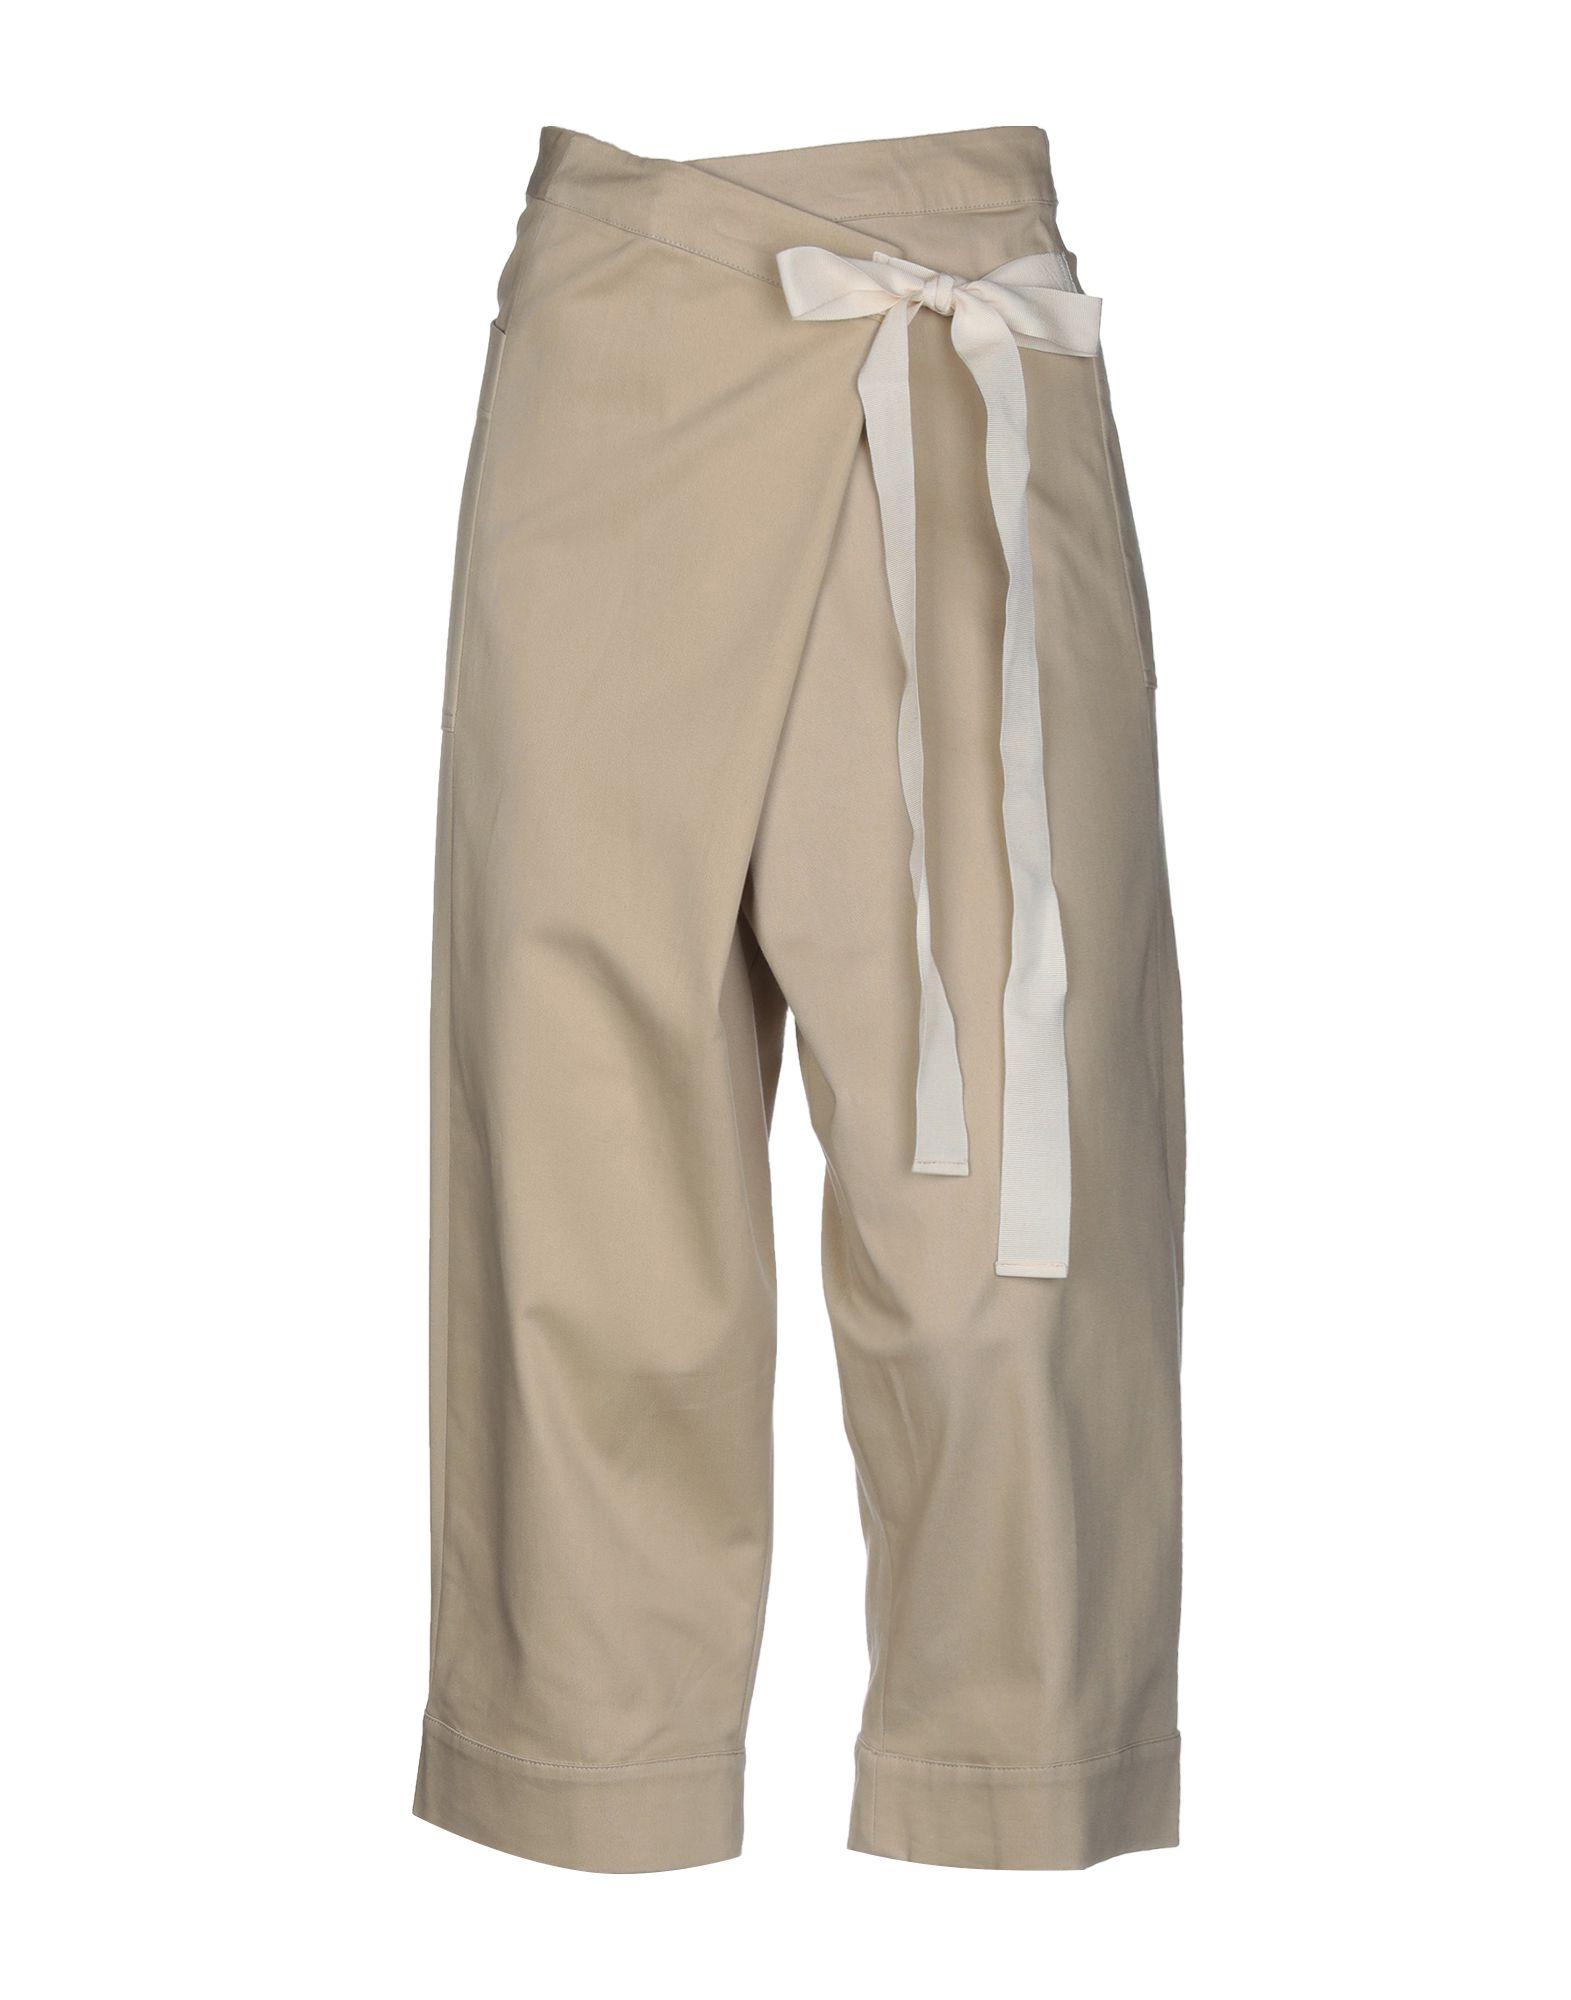 ROSE' A POIS Повседневные брюки olga chernobryvets vestito rosso apois isbn 9785448310492